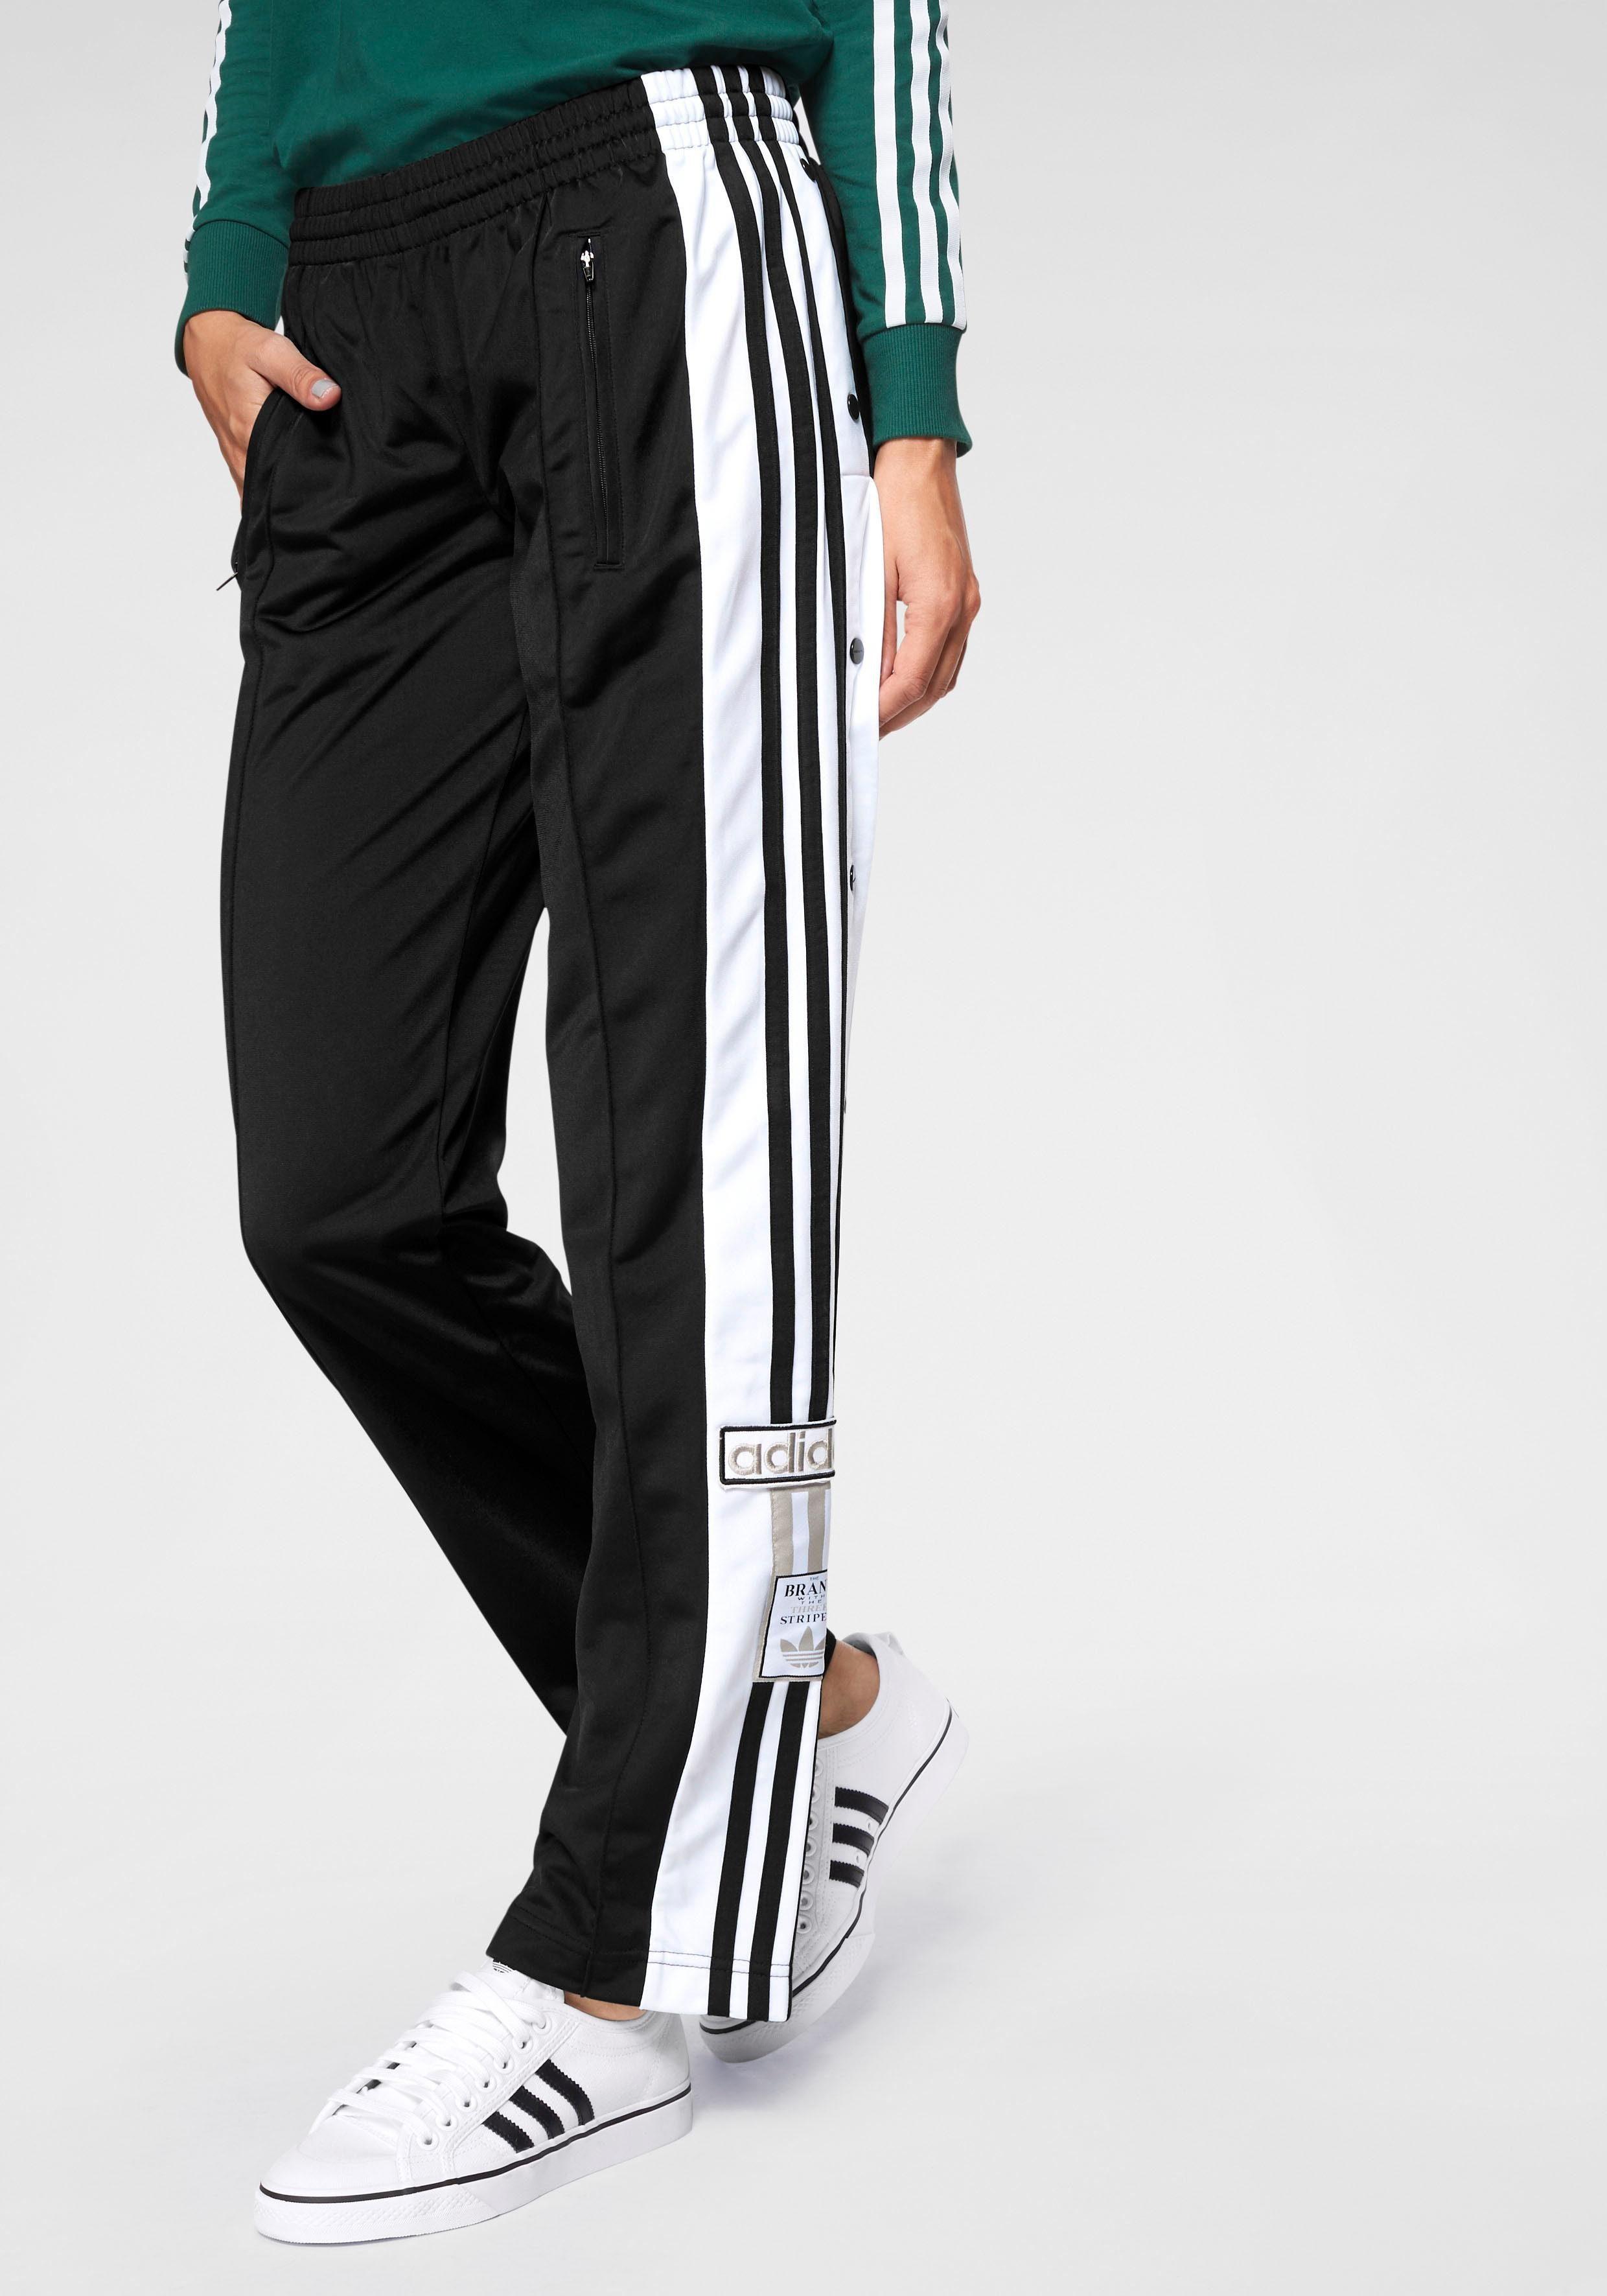 adidas Originals Trainingshose »ADIBREAK PANT«, Logostickerei und badge online kaufen | OTTO